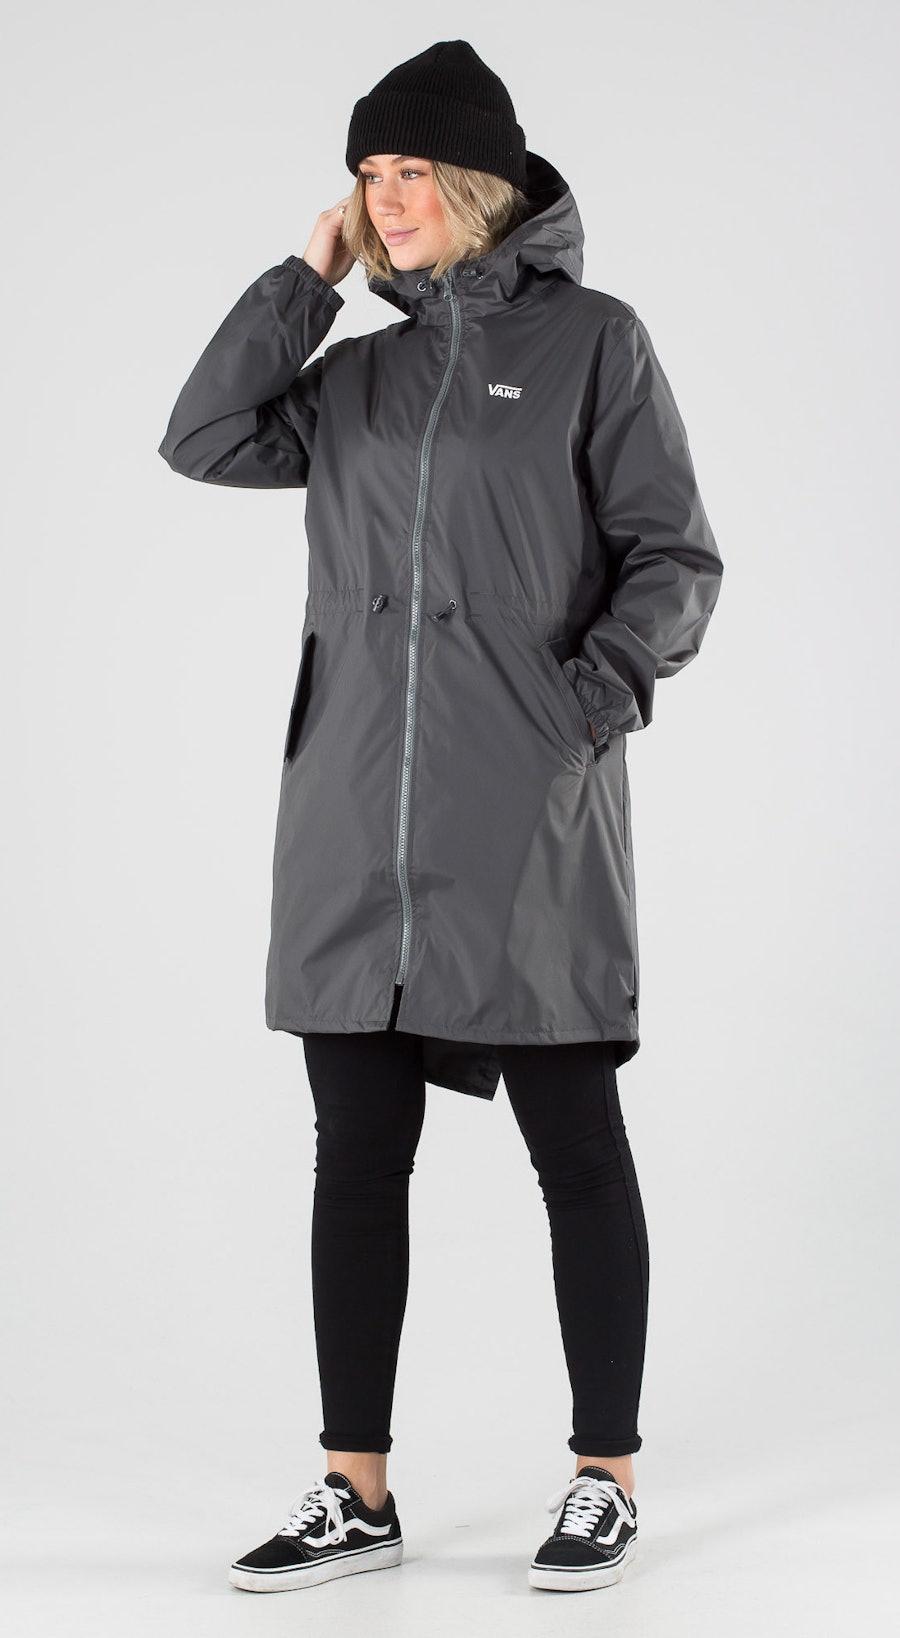 Vans Kastle V Long Windbreaker MTE Asphalt Outfit Multi